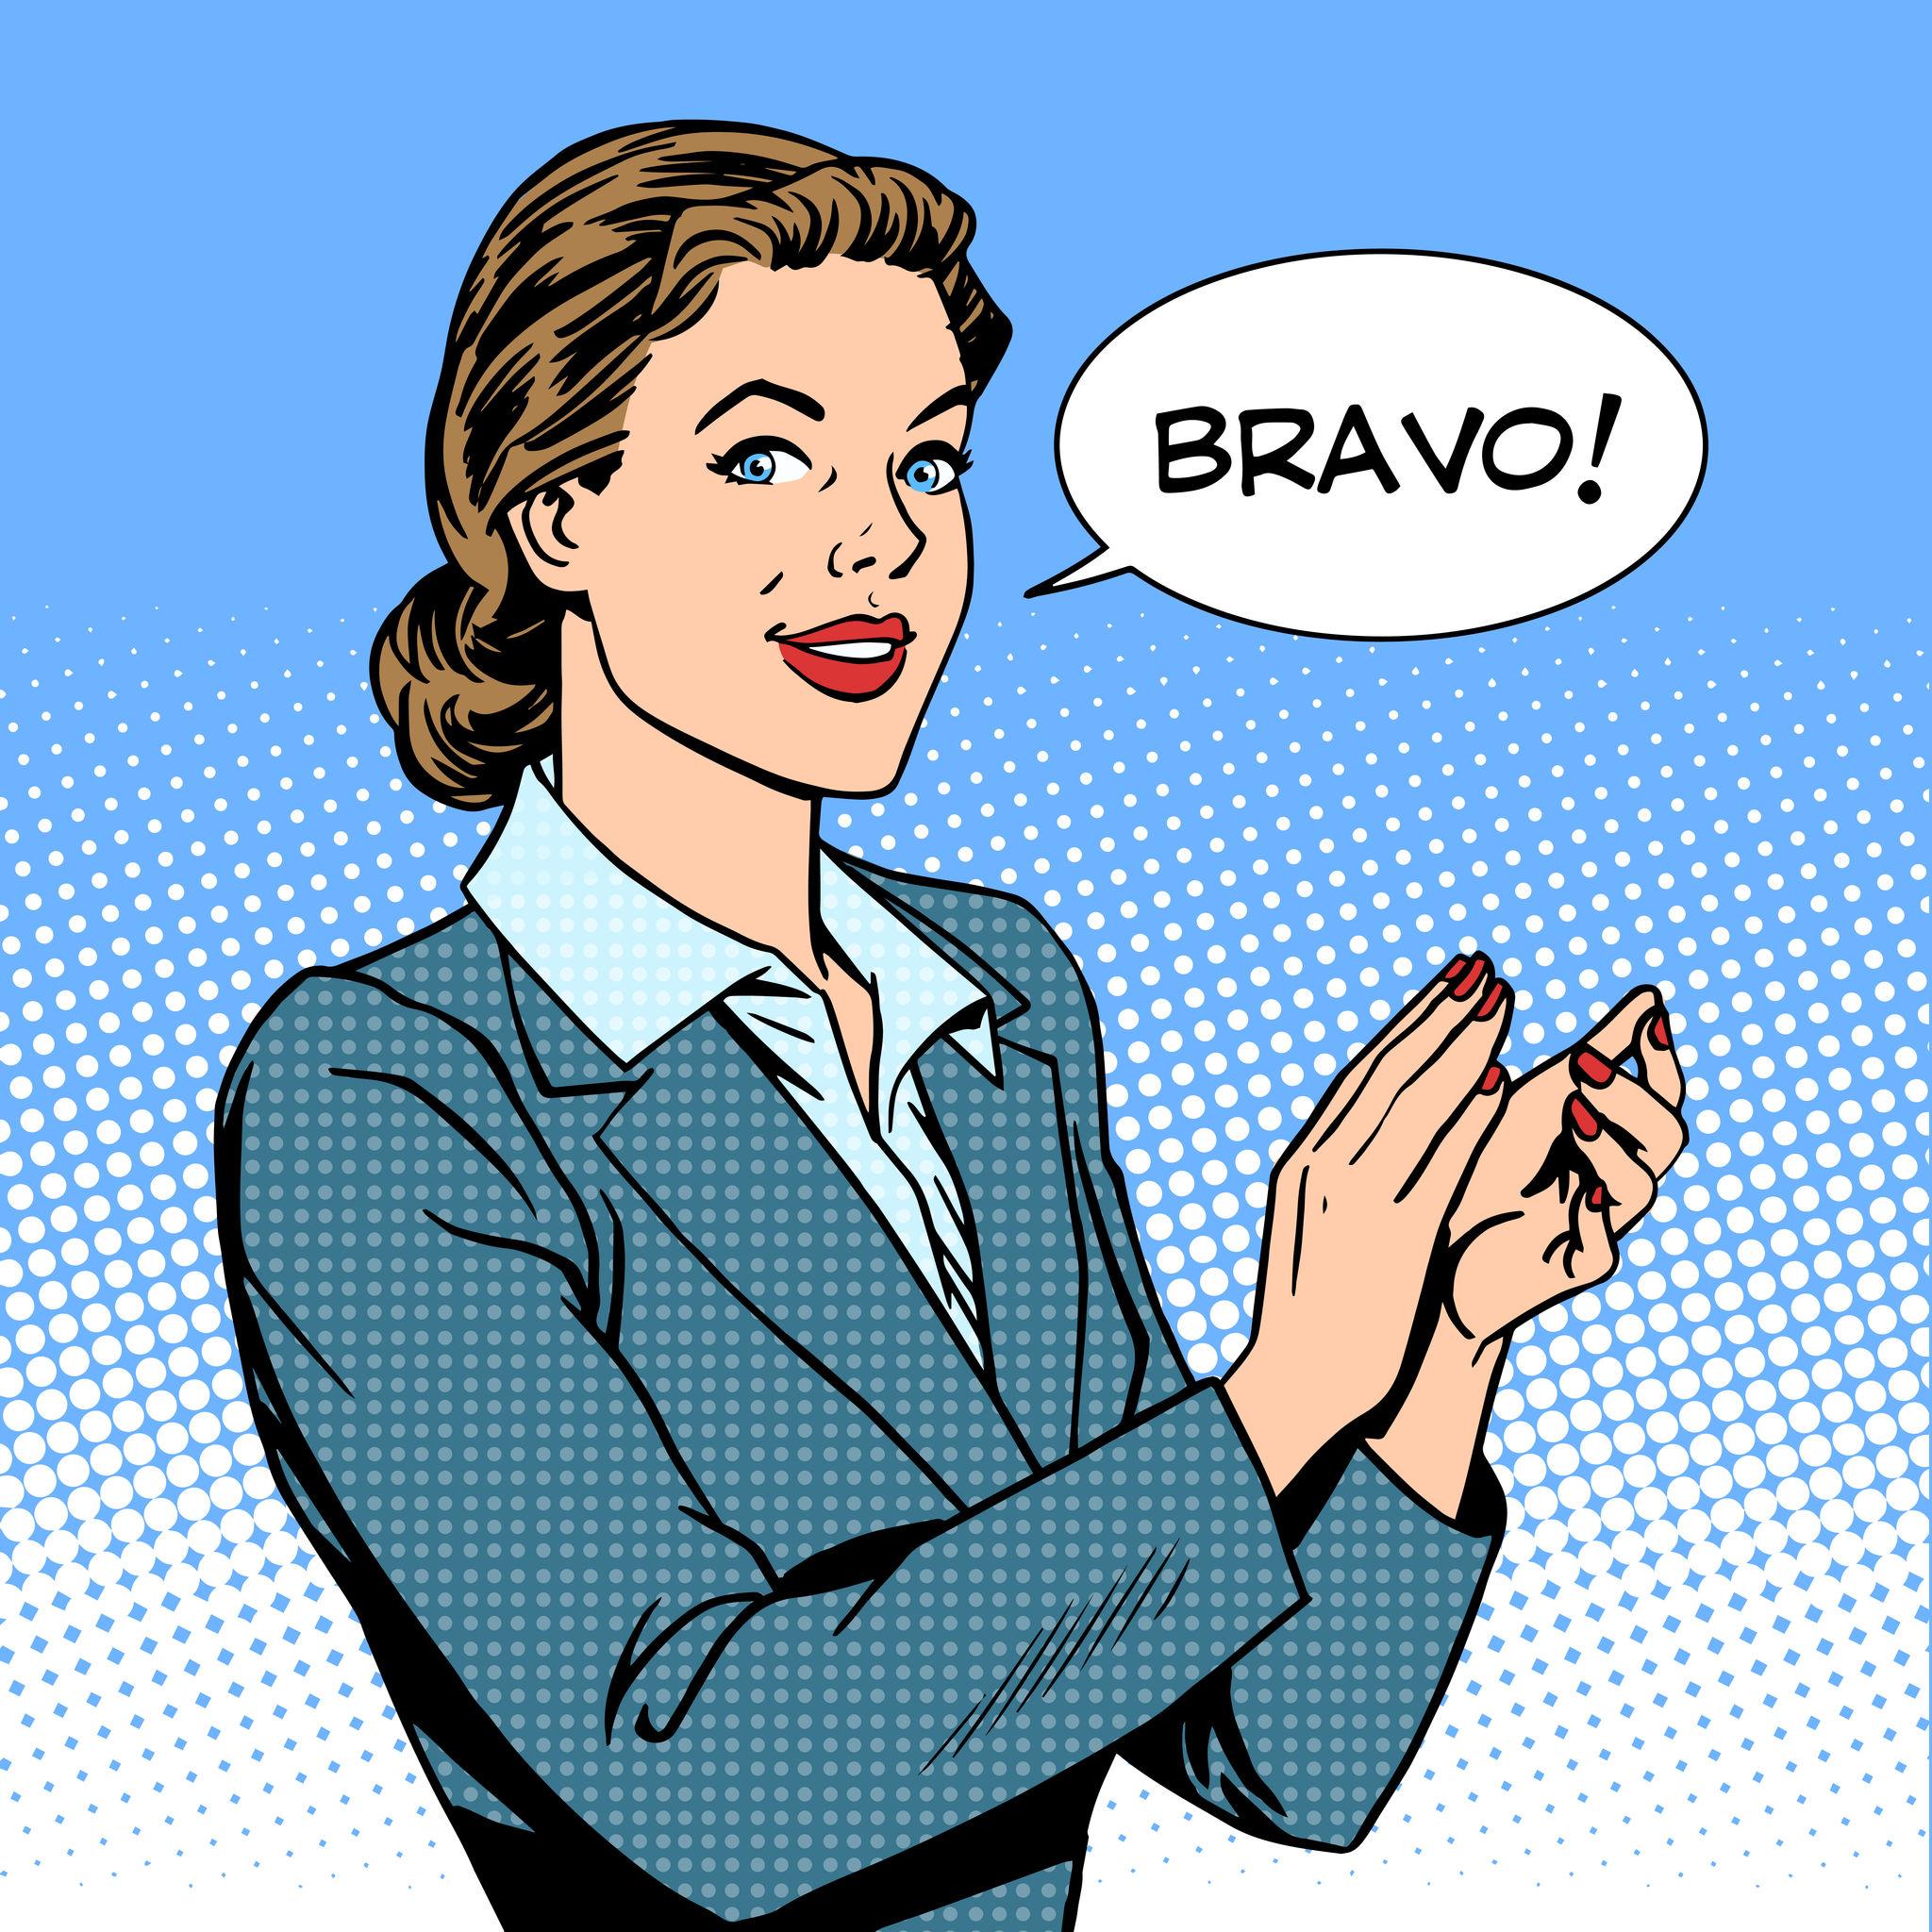 45139362 – woman applause bravo concept of success retro style pop art